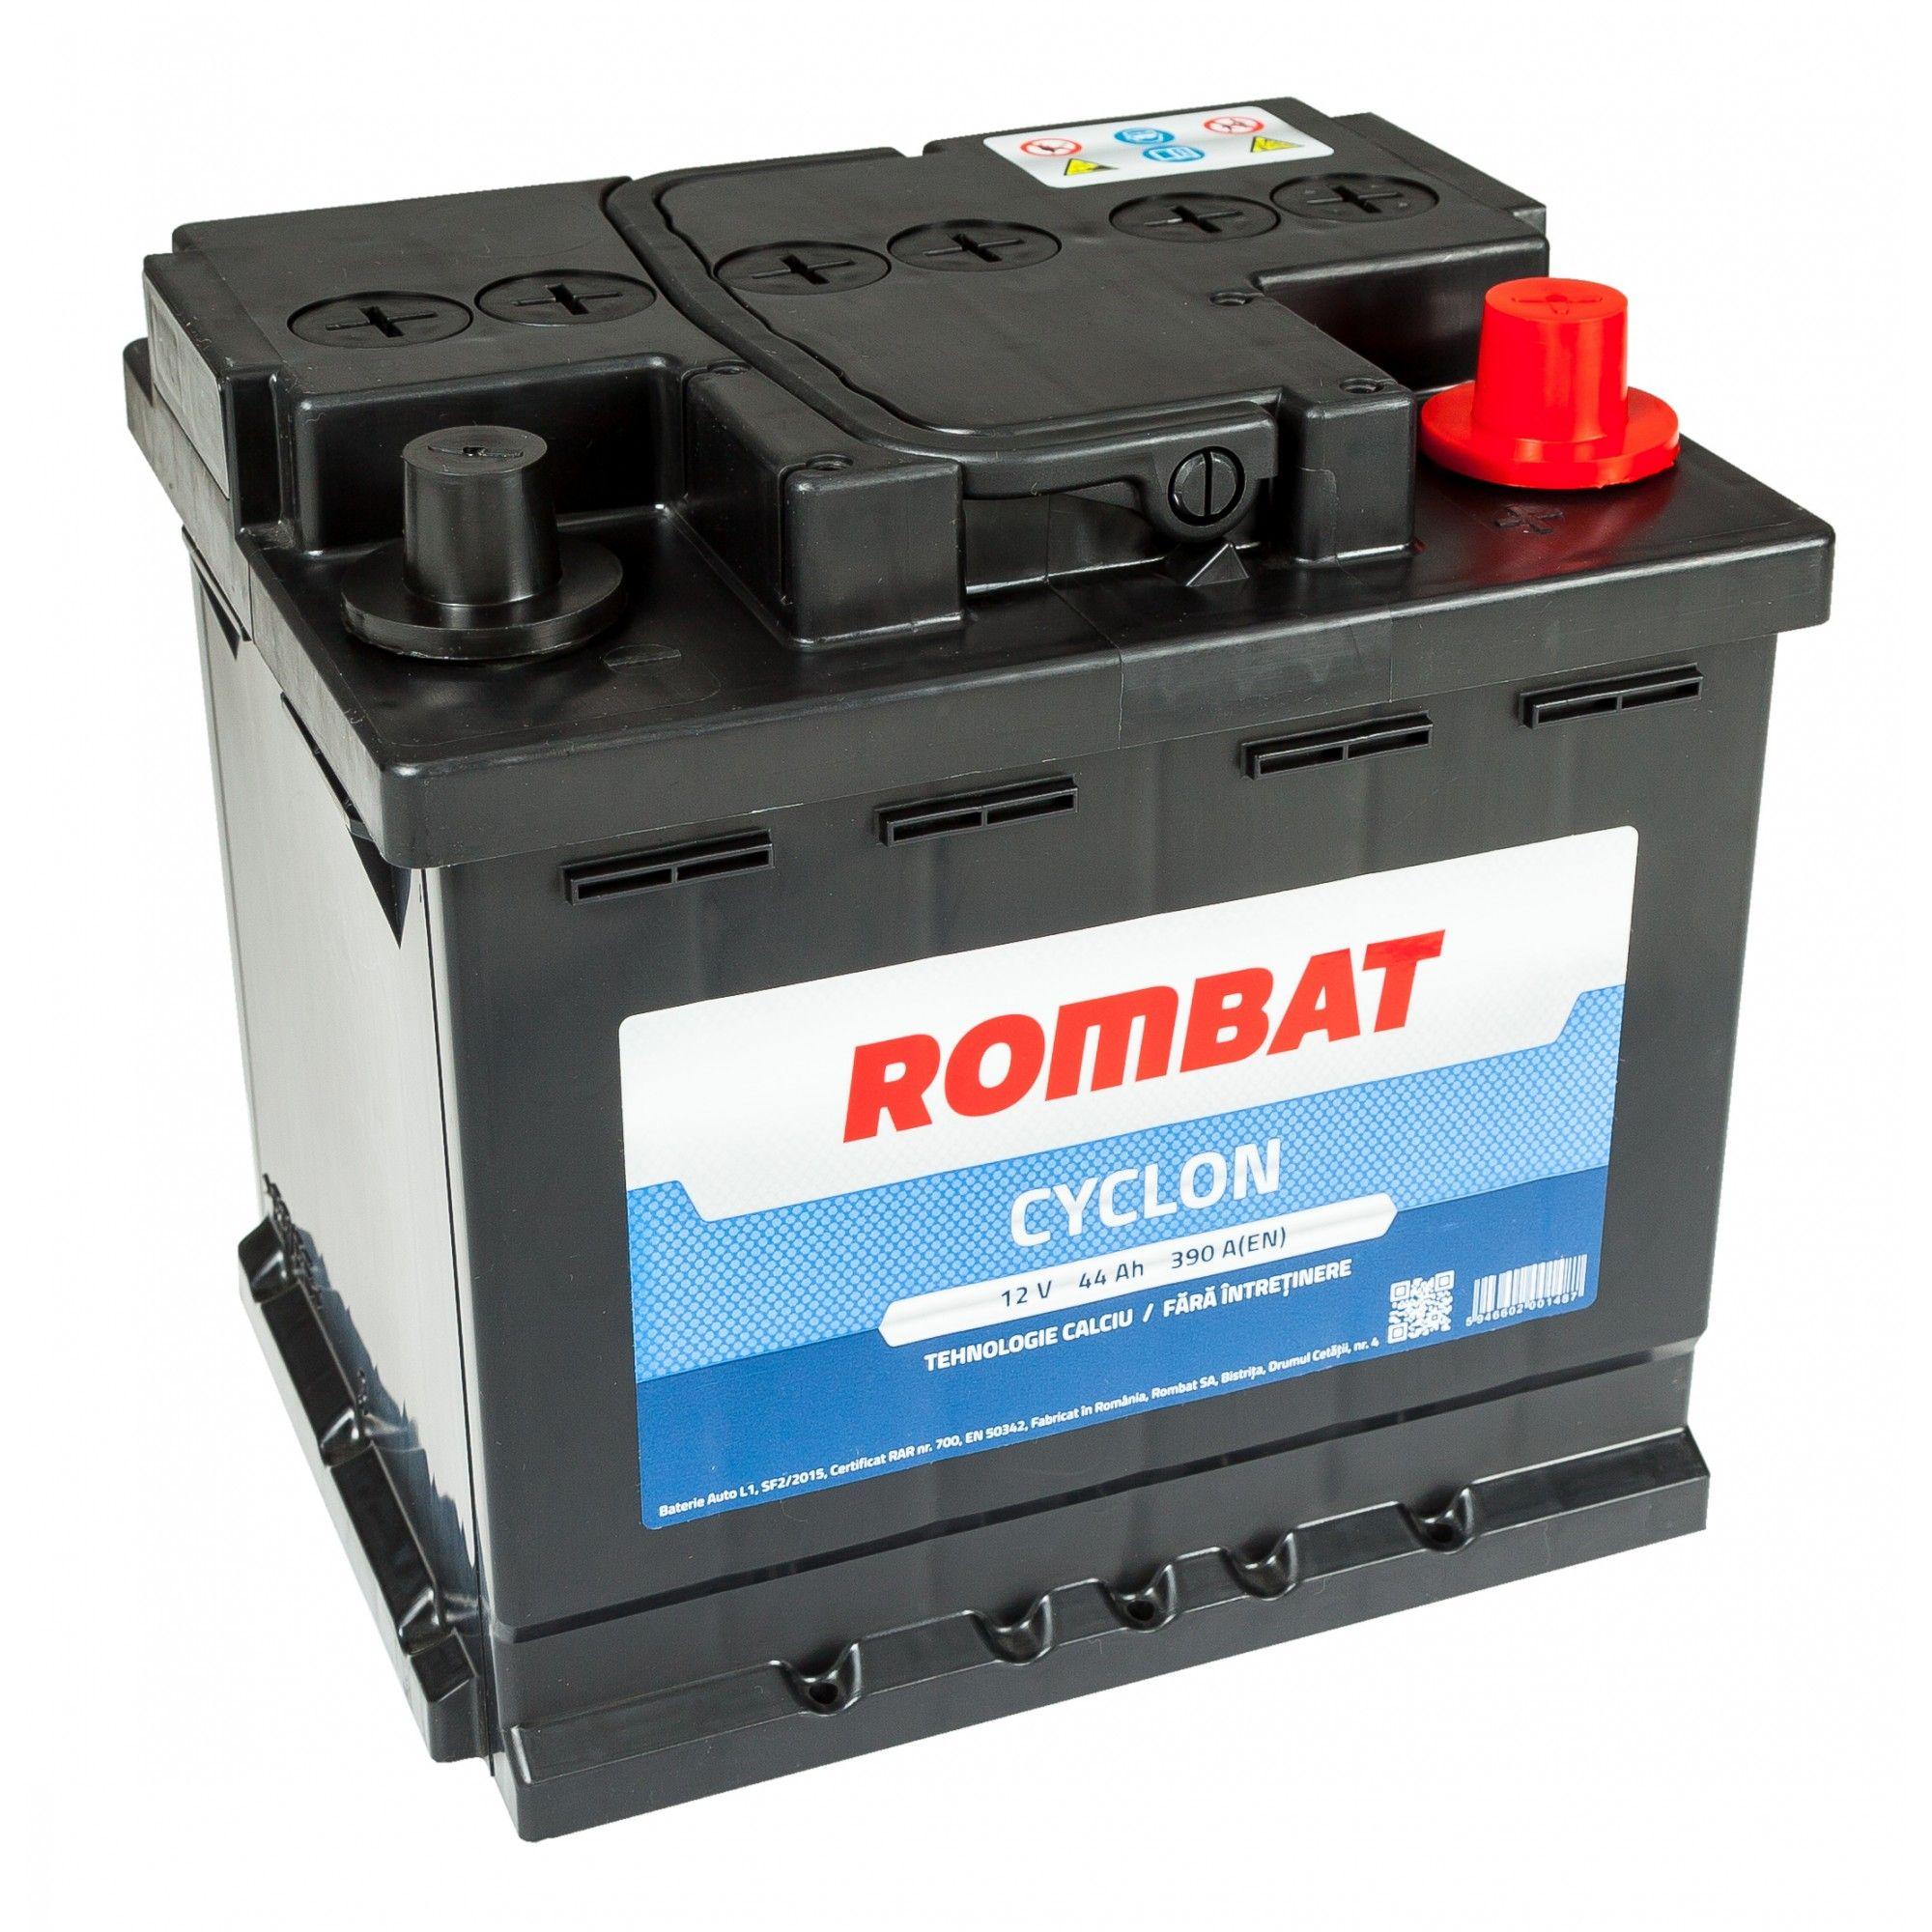 Baterie auto ROMBAT CYCLON 12V 44AH, 390A